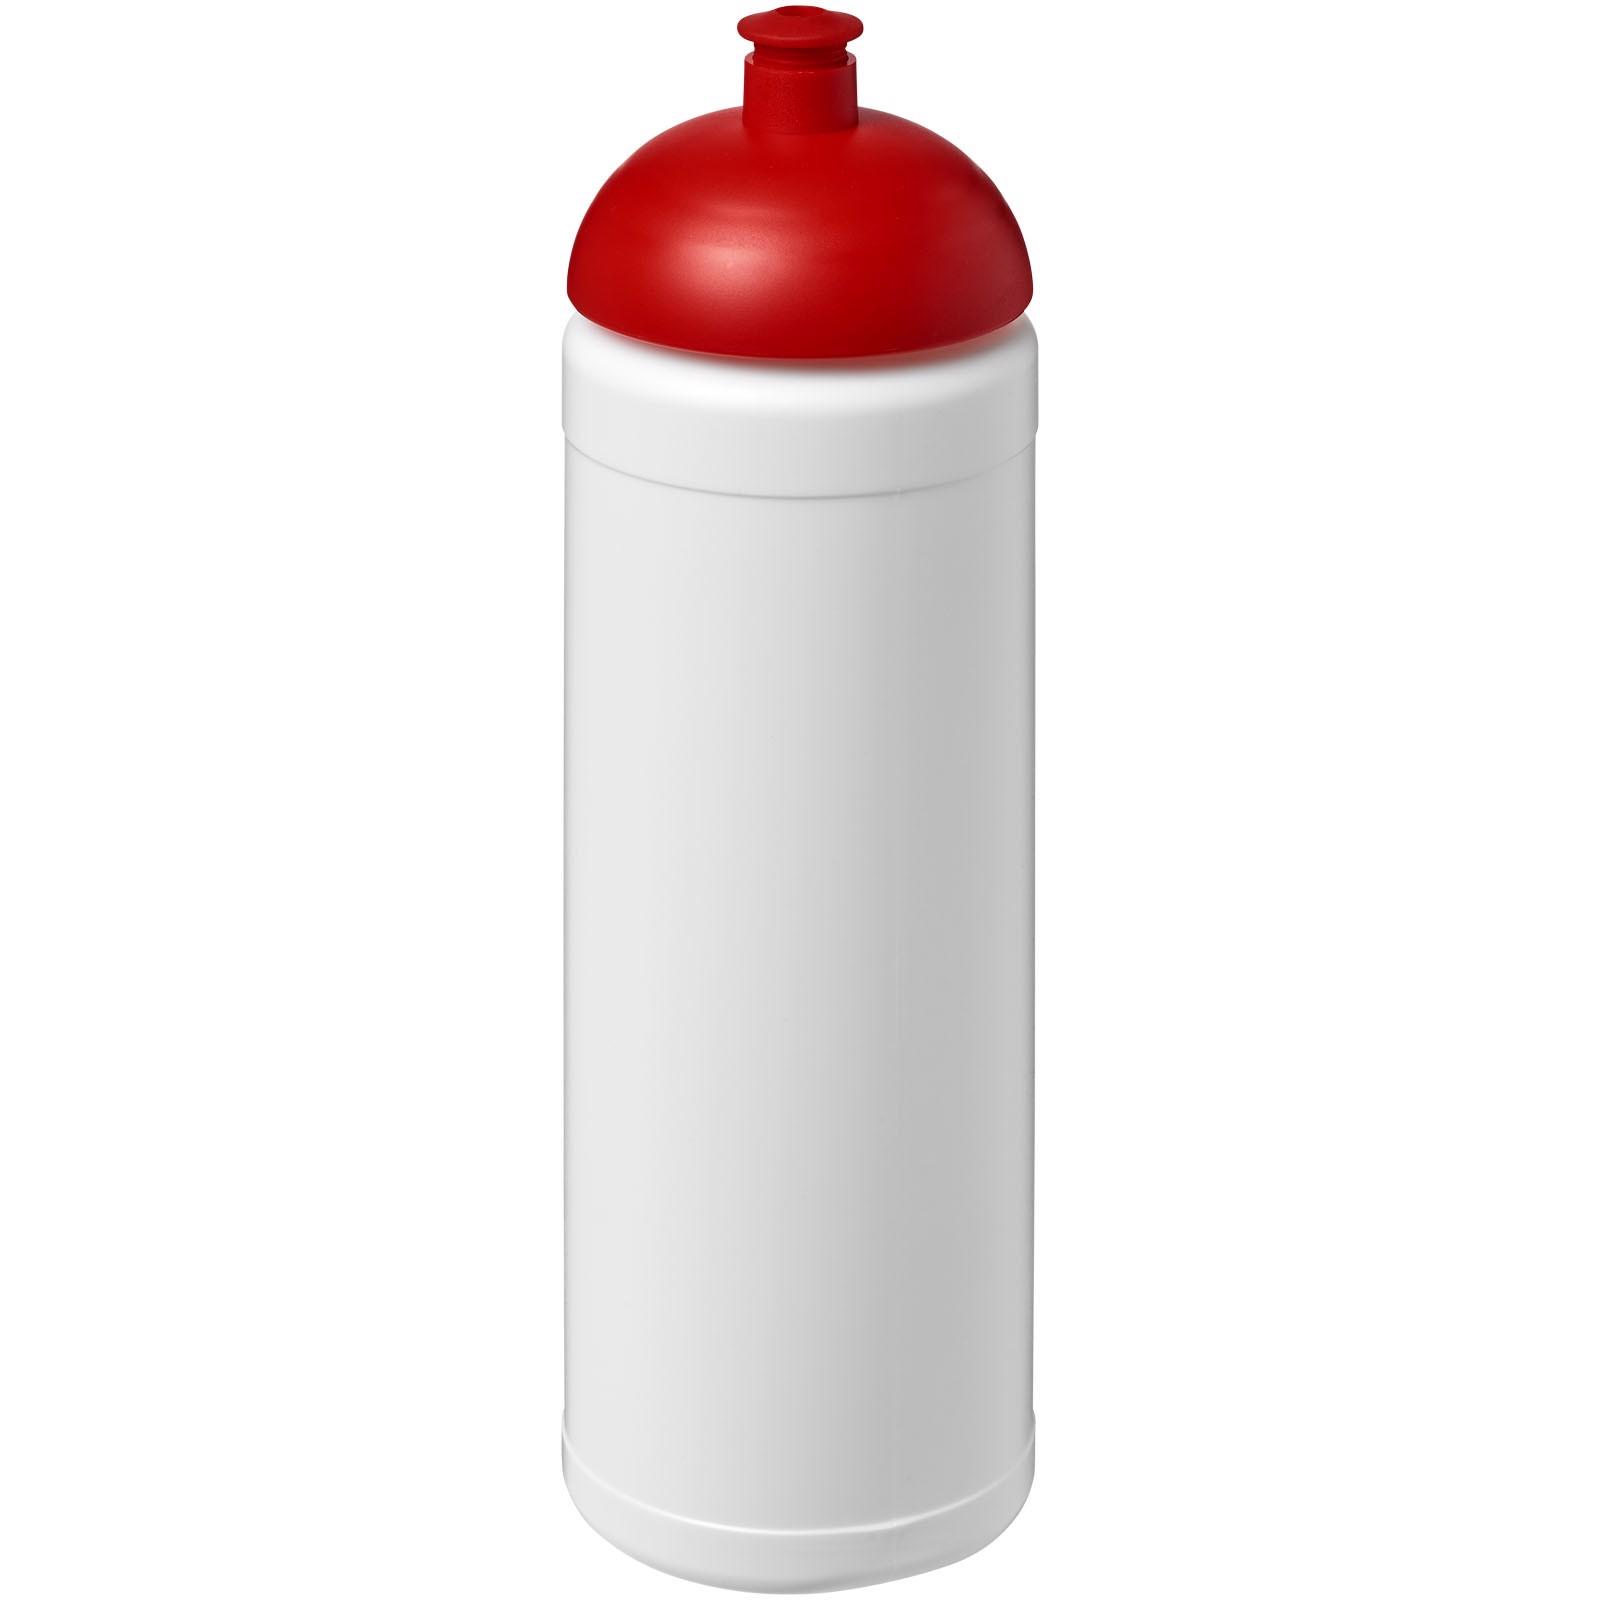 Baseline® Plus 750 ml dome lid sport bottle - White / Red